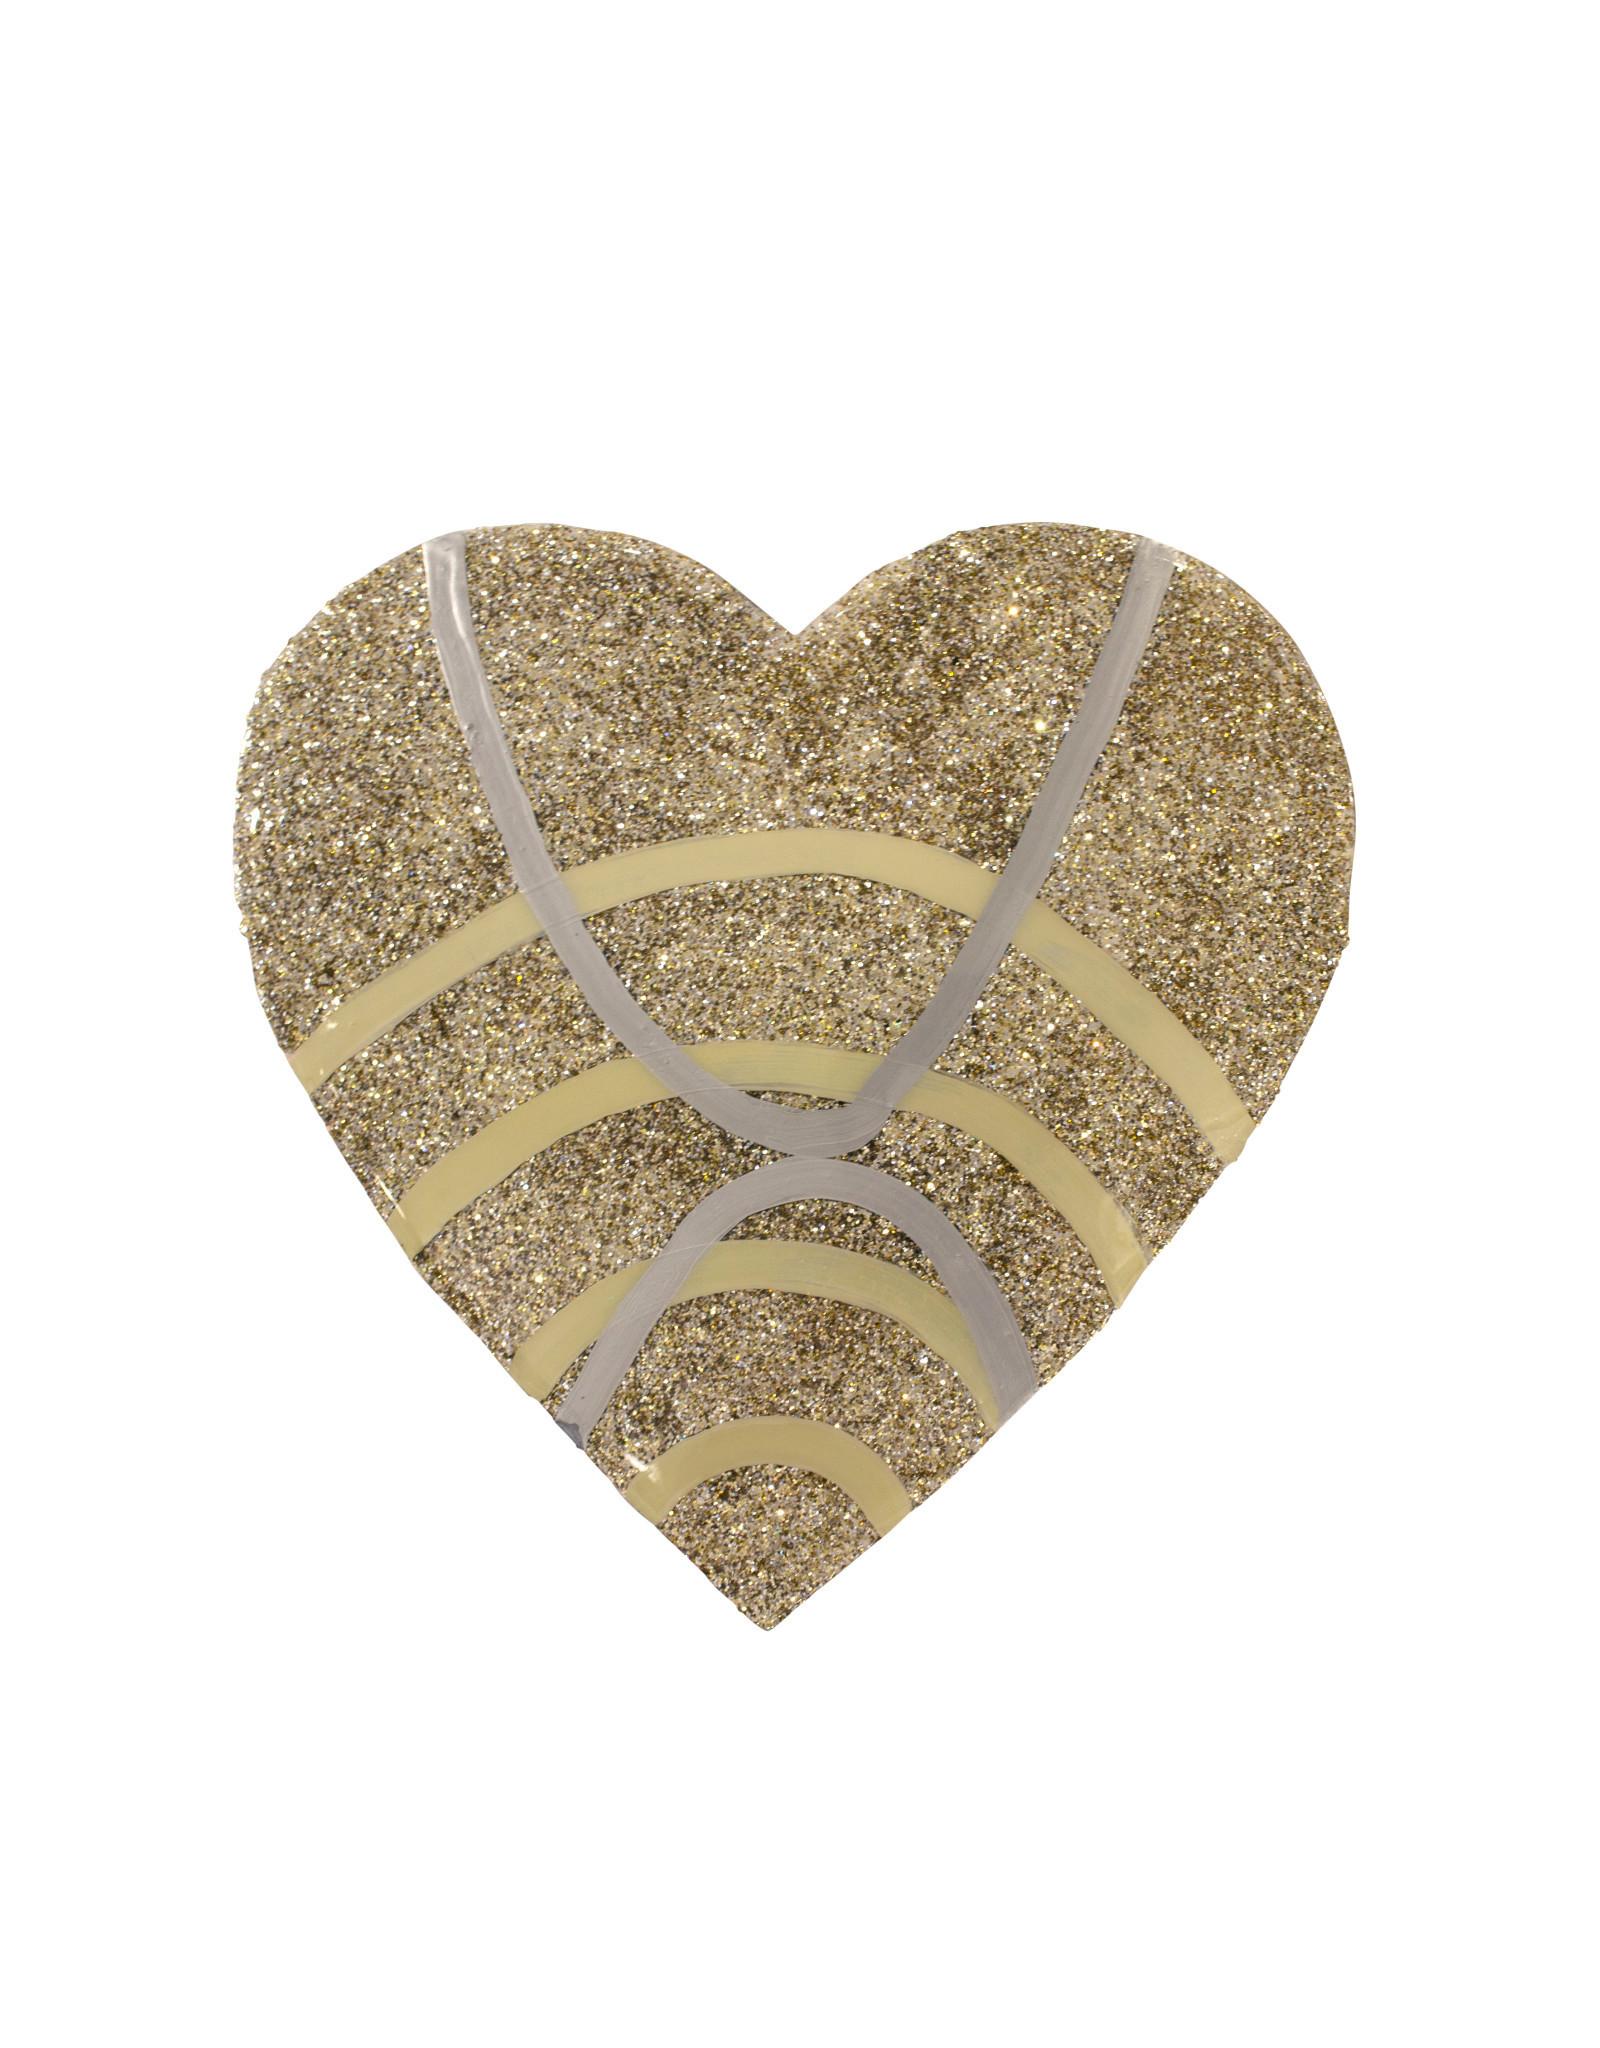 Entouquet Champagne Glitter + Silver | Cream Line Design Large Heart